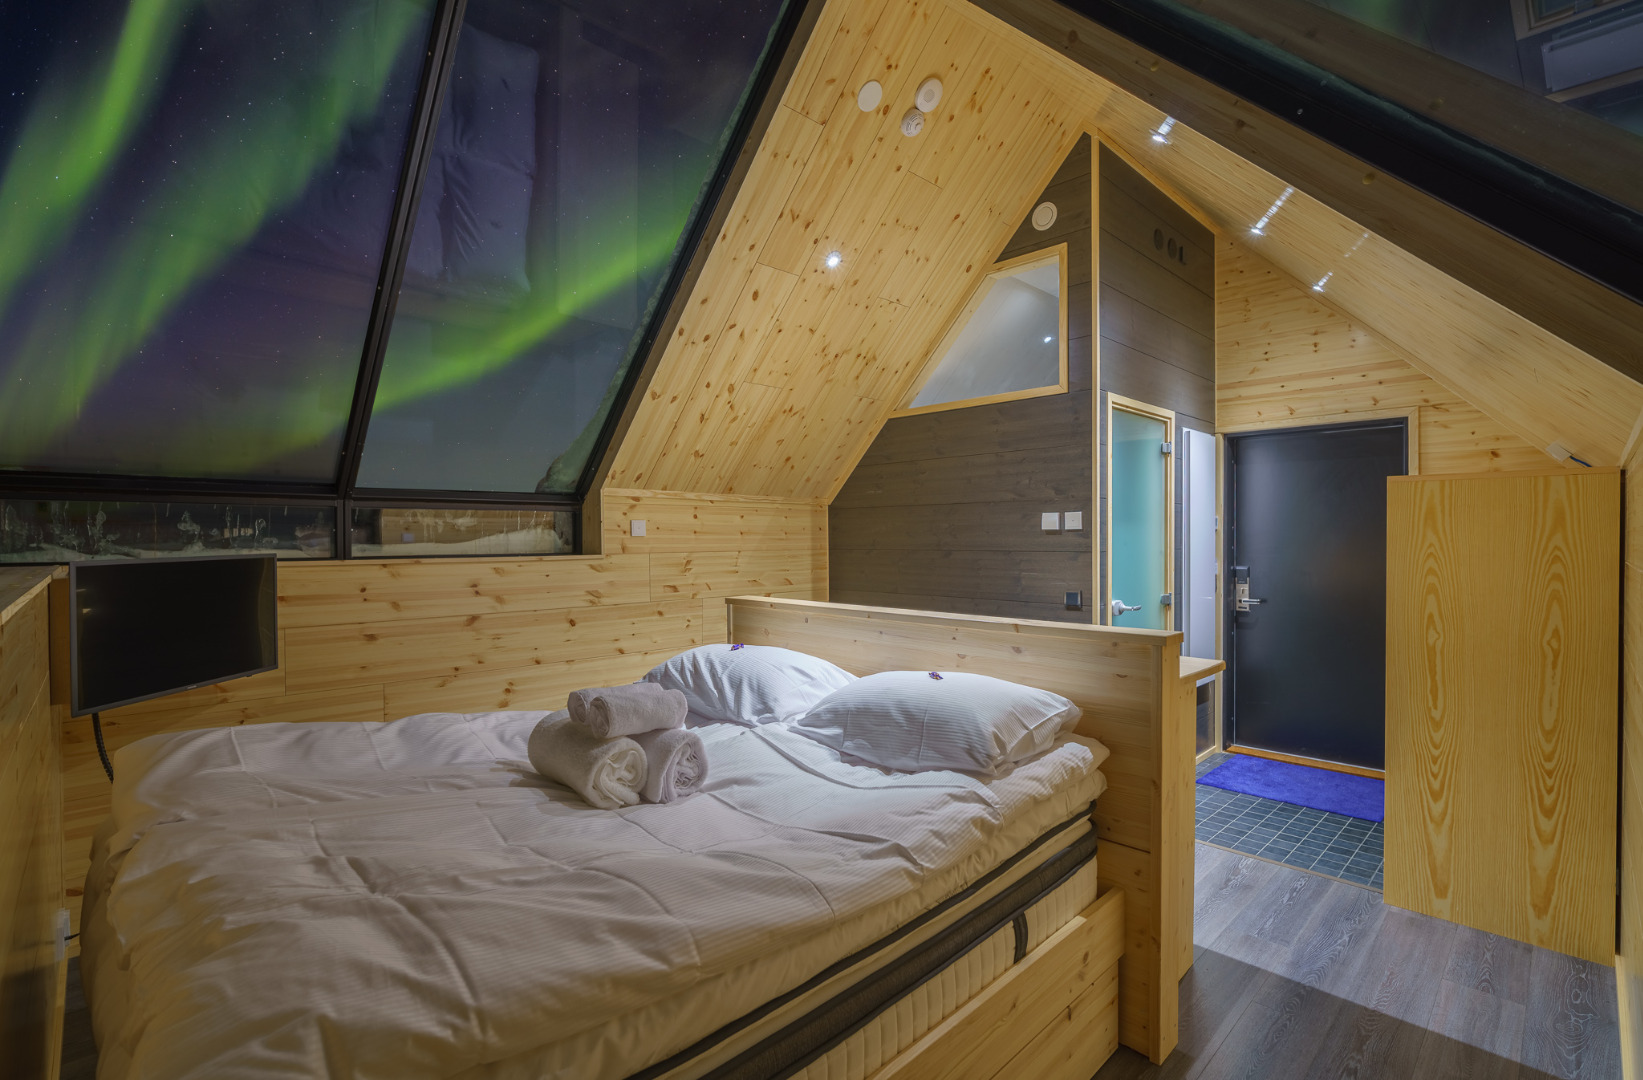 Santa's Star Arctic Hotel - Type B Glass Cabin